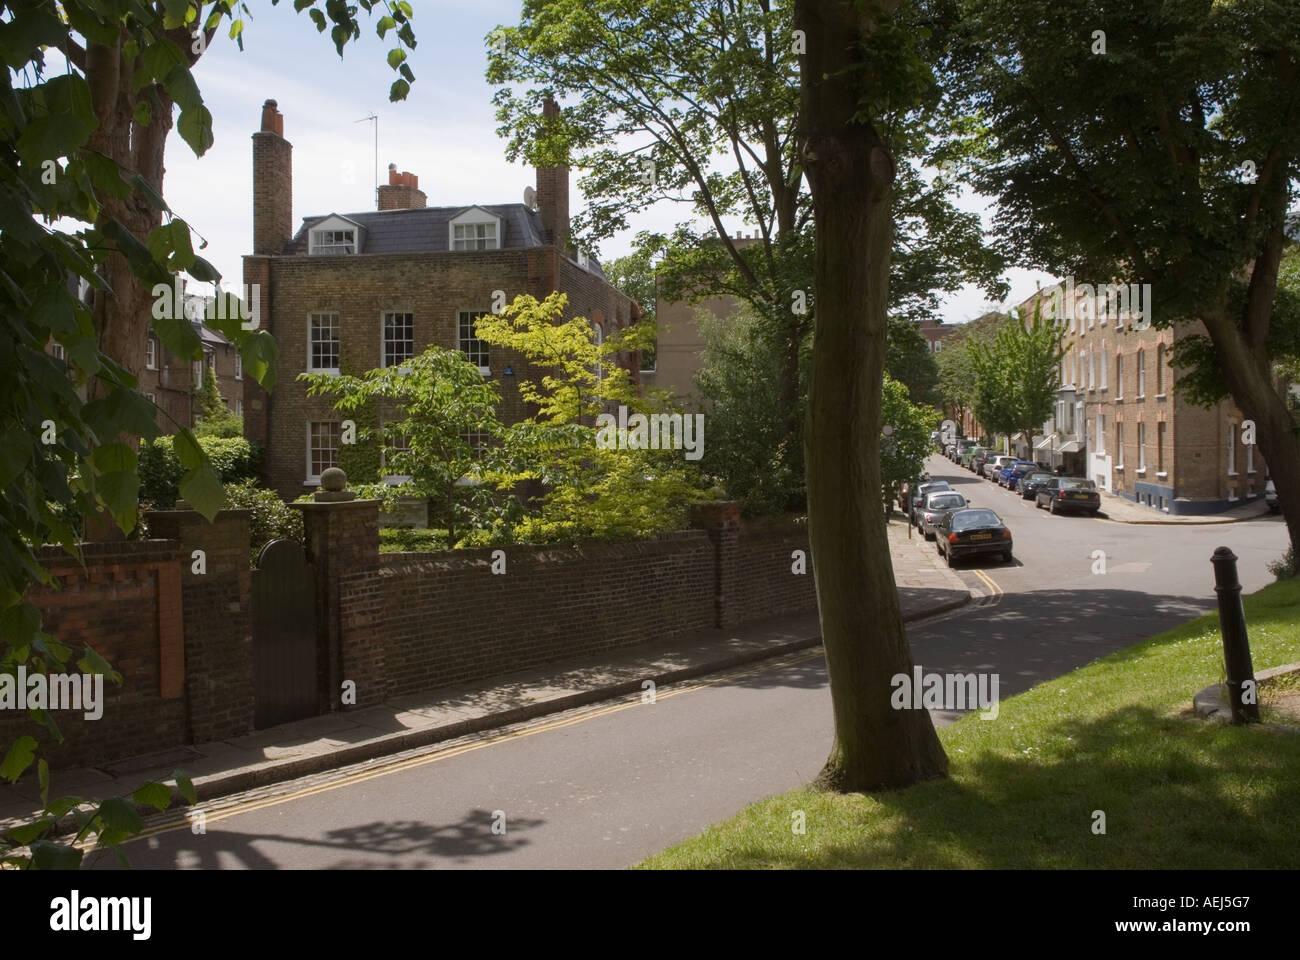 Flask walk leading to Gardnor Road Hampstead village London NW3 England HOMER SYKES - Stock Image